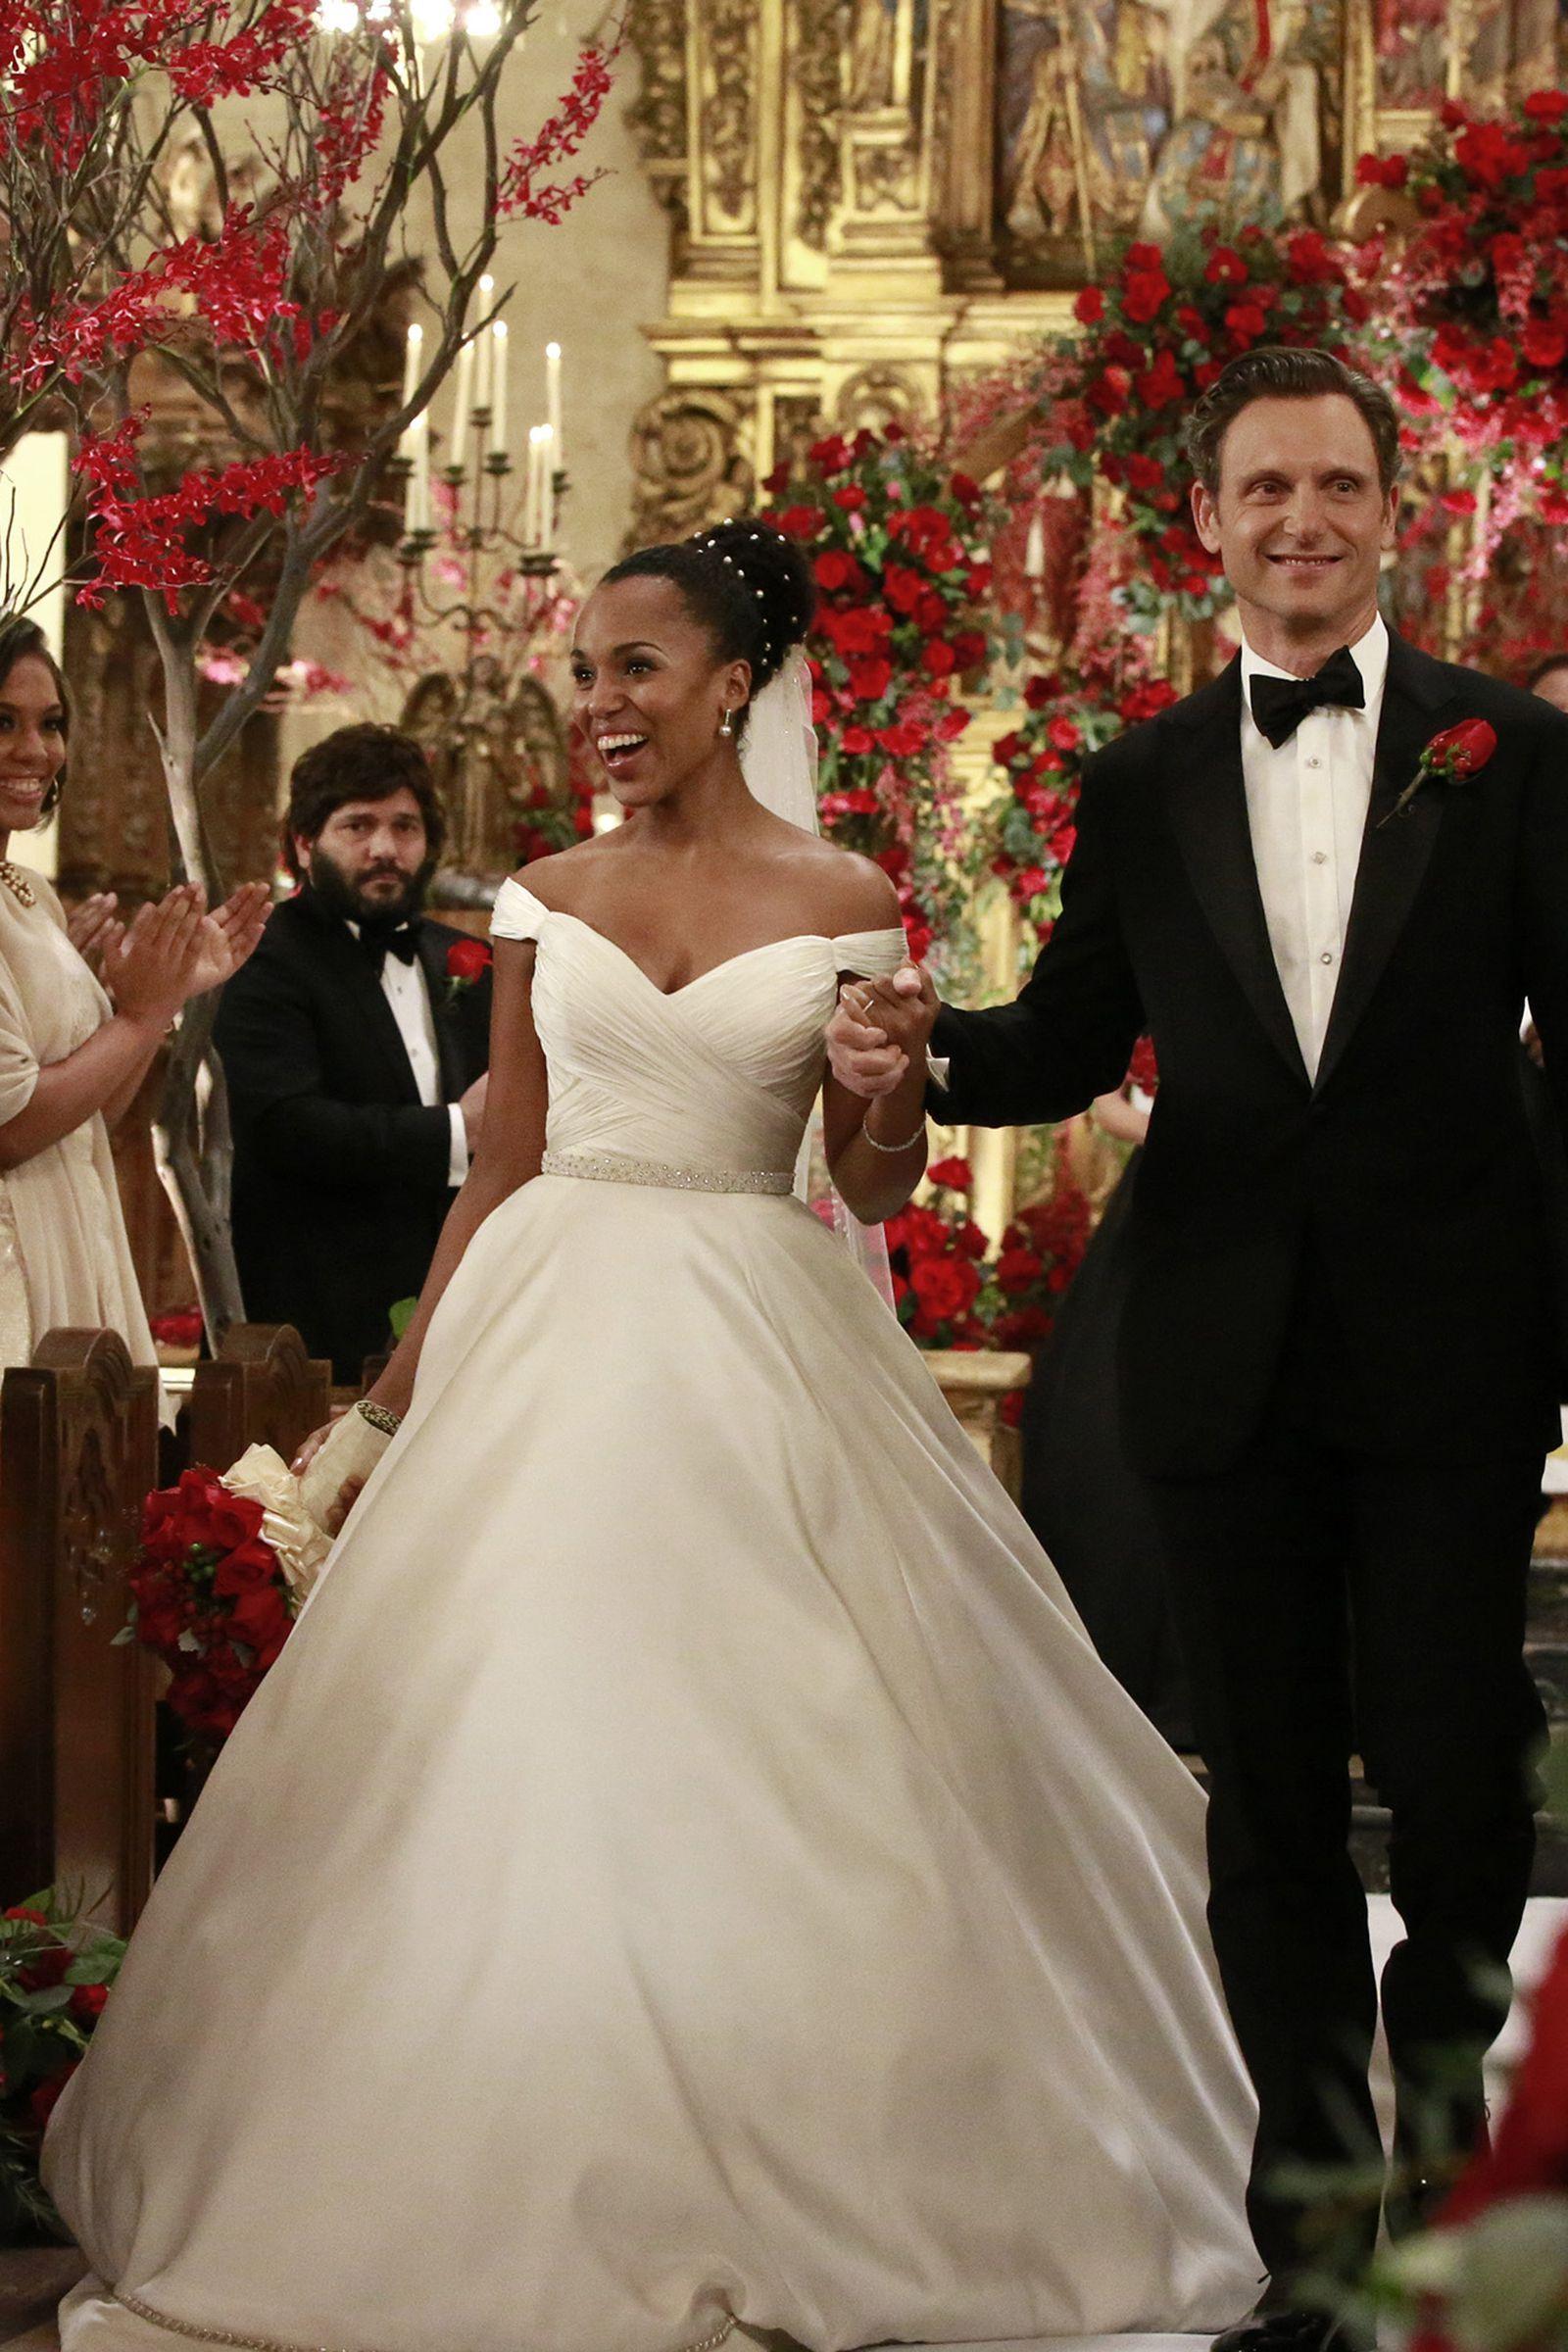 Gorgeous wedding dresses from unashvilleu ufriendsu and other tv